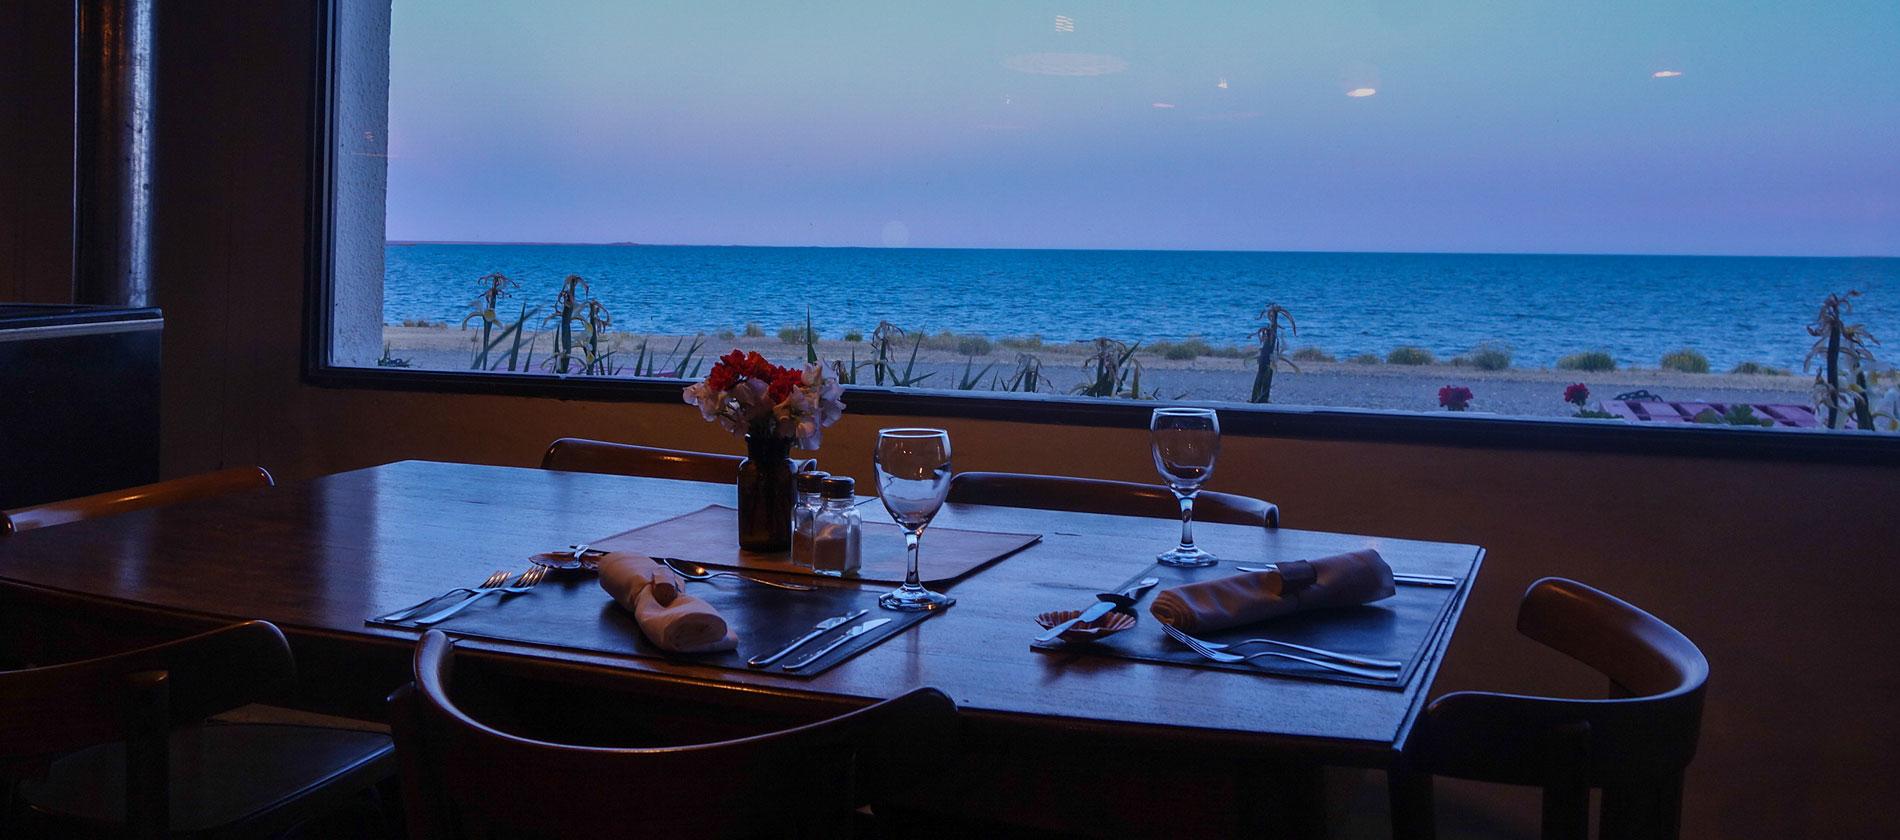 Romantic dinne at Bustamente - Patagonia, Argentina